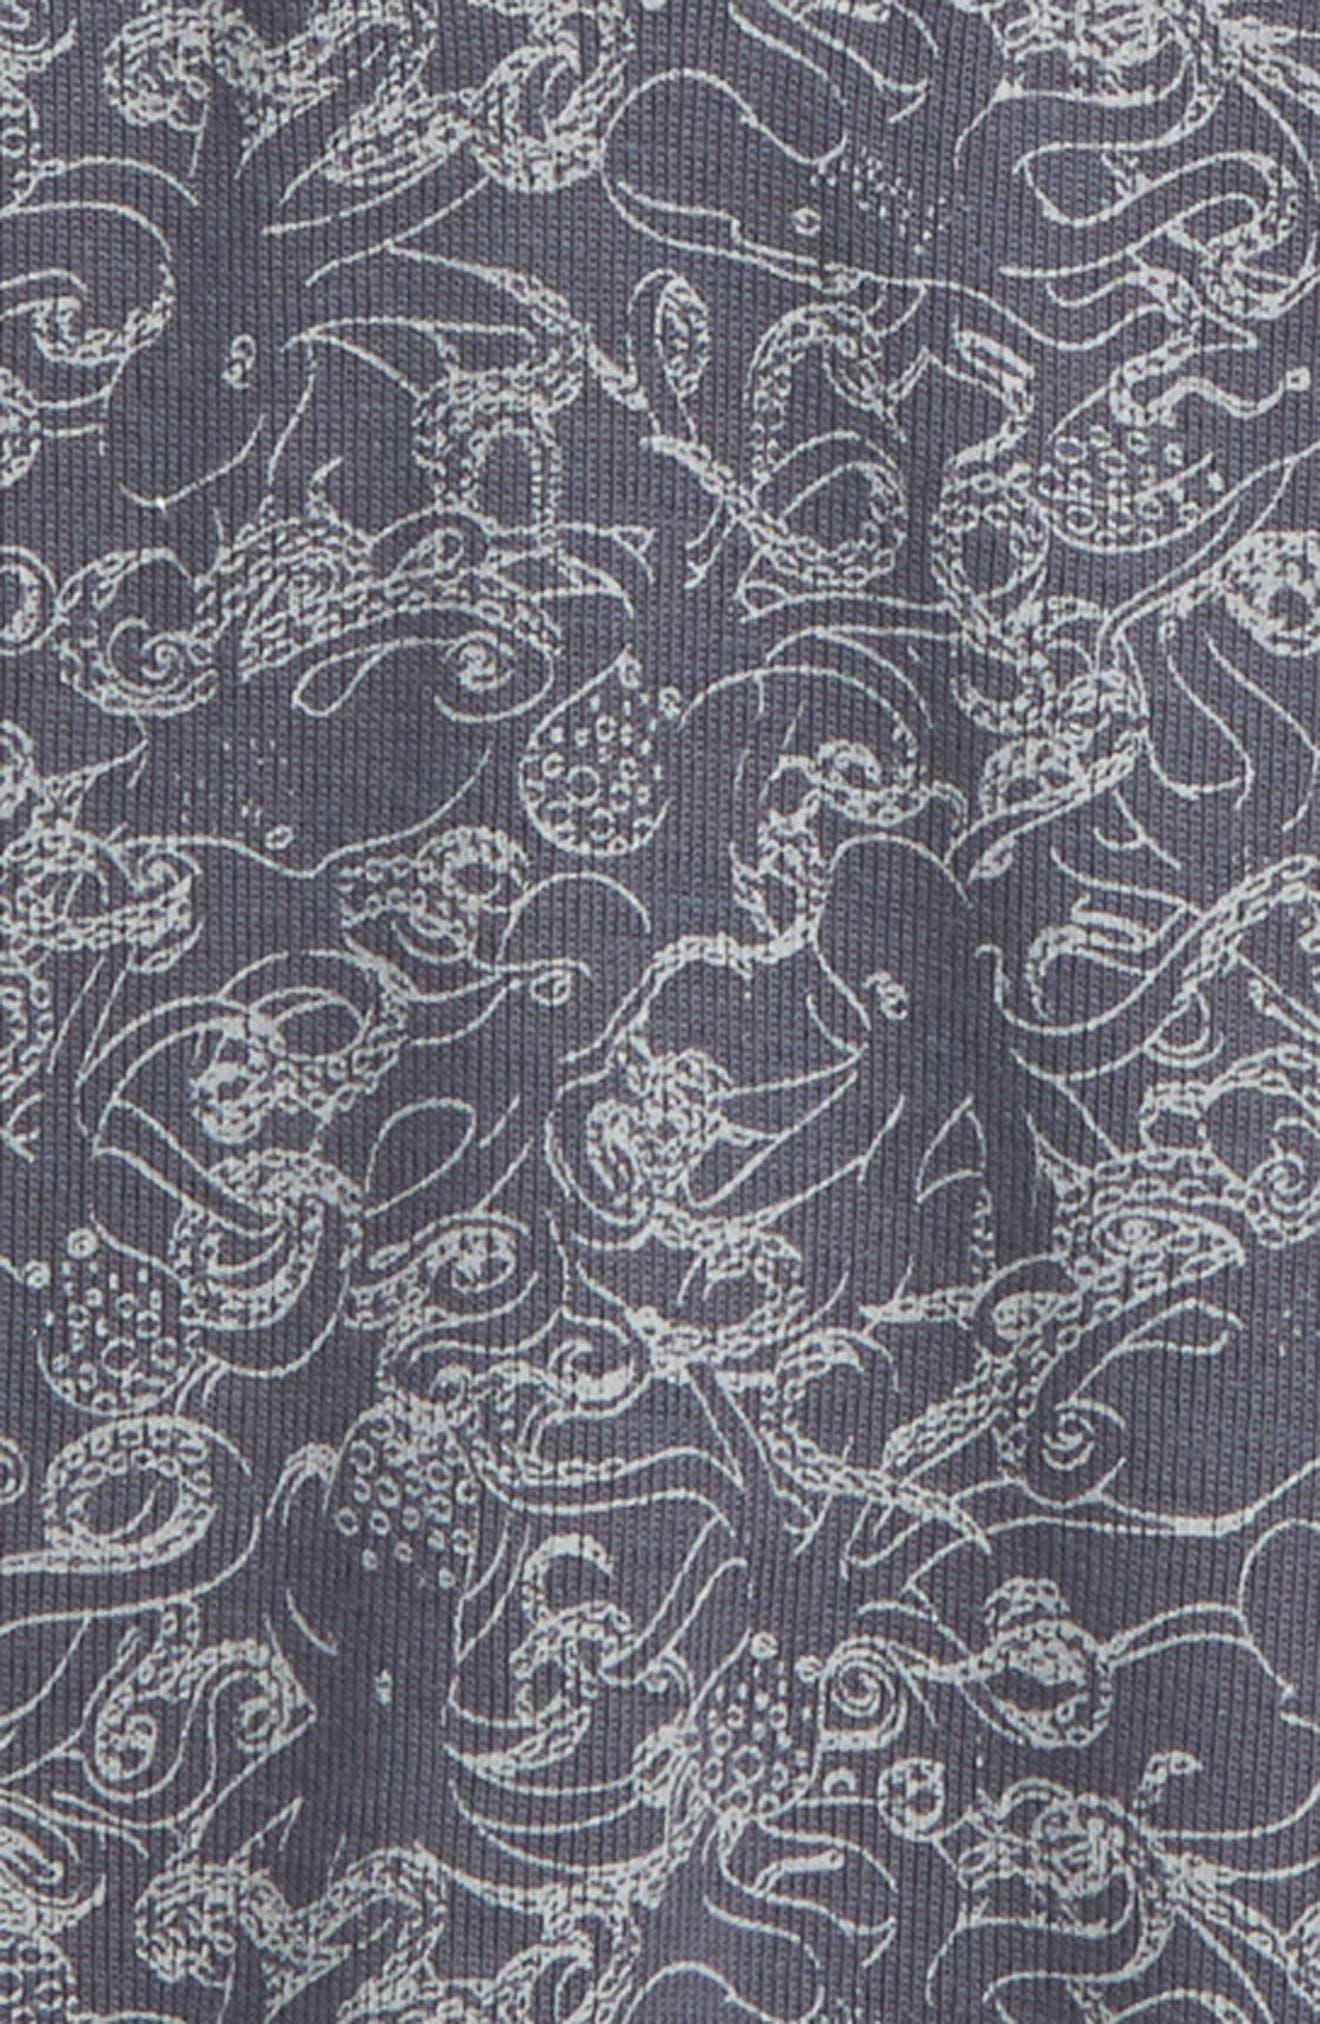 Bertram Print T-Shirt,                             Alternate thumbnail 2, color,                             Greyblue